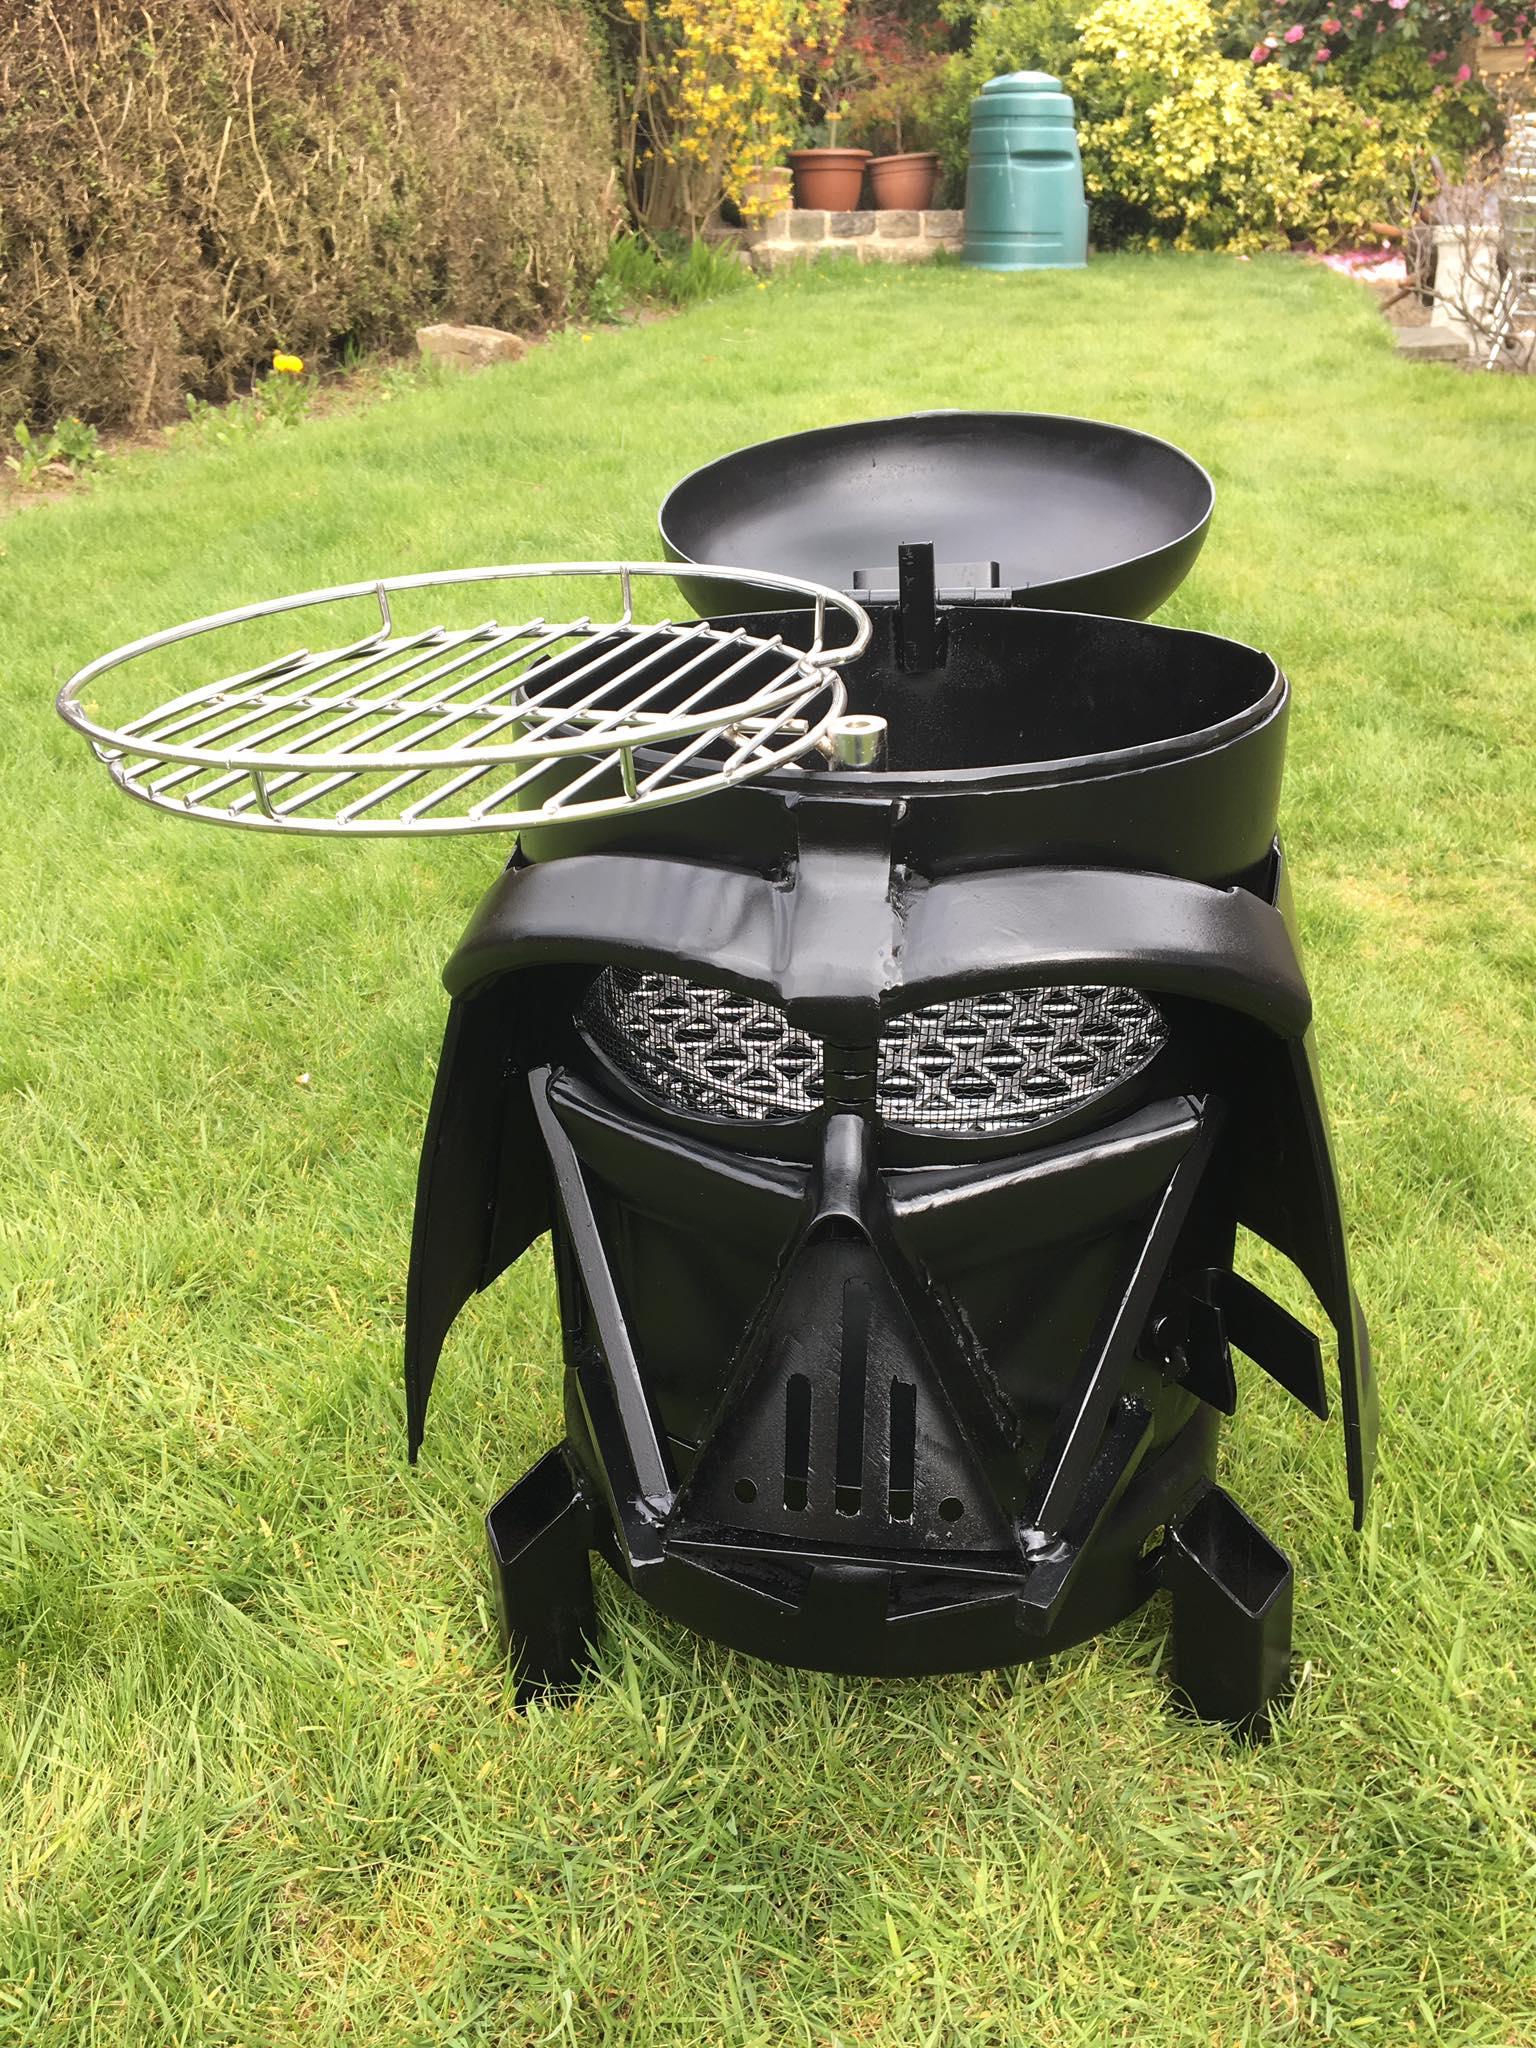 Darth Vader Backyard Grill and Wood Burner Hes More BBQ